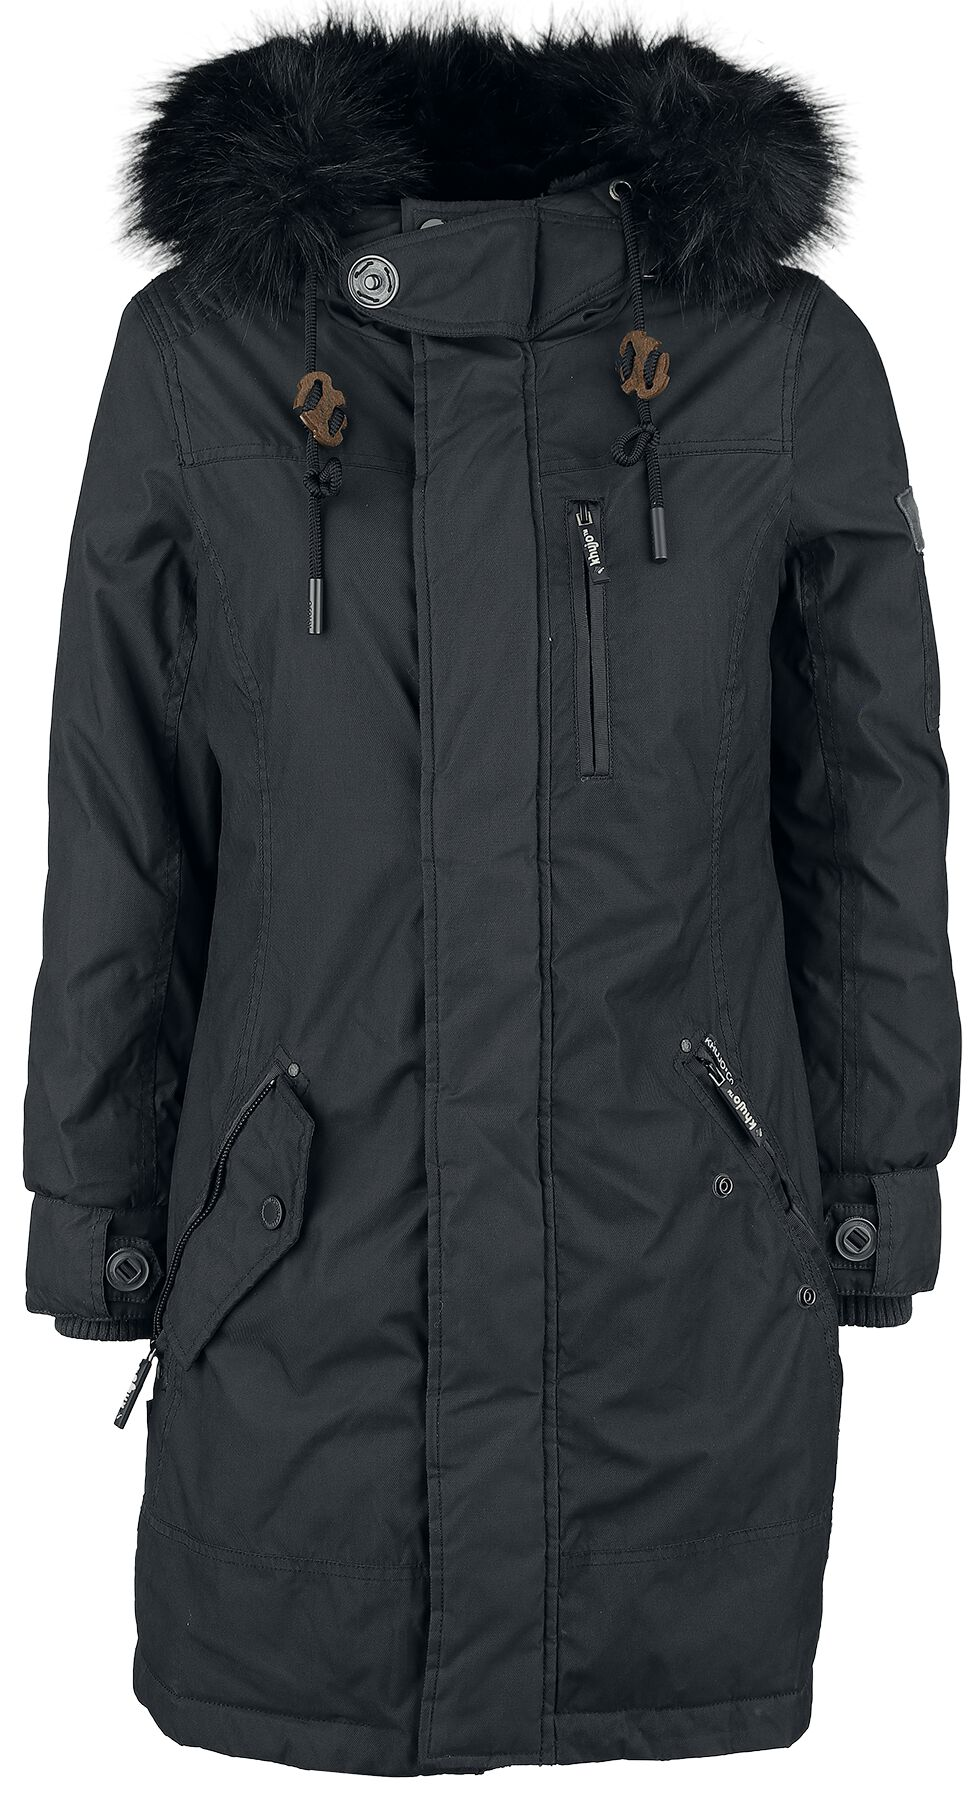 ef7b8924f7 Winter Jacket